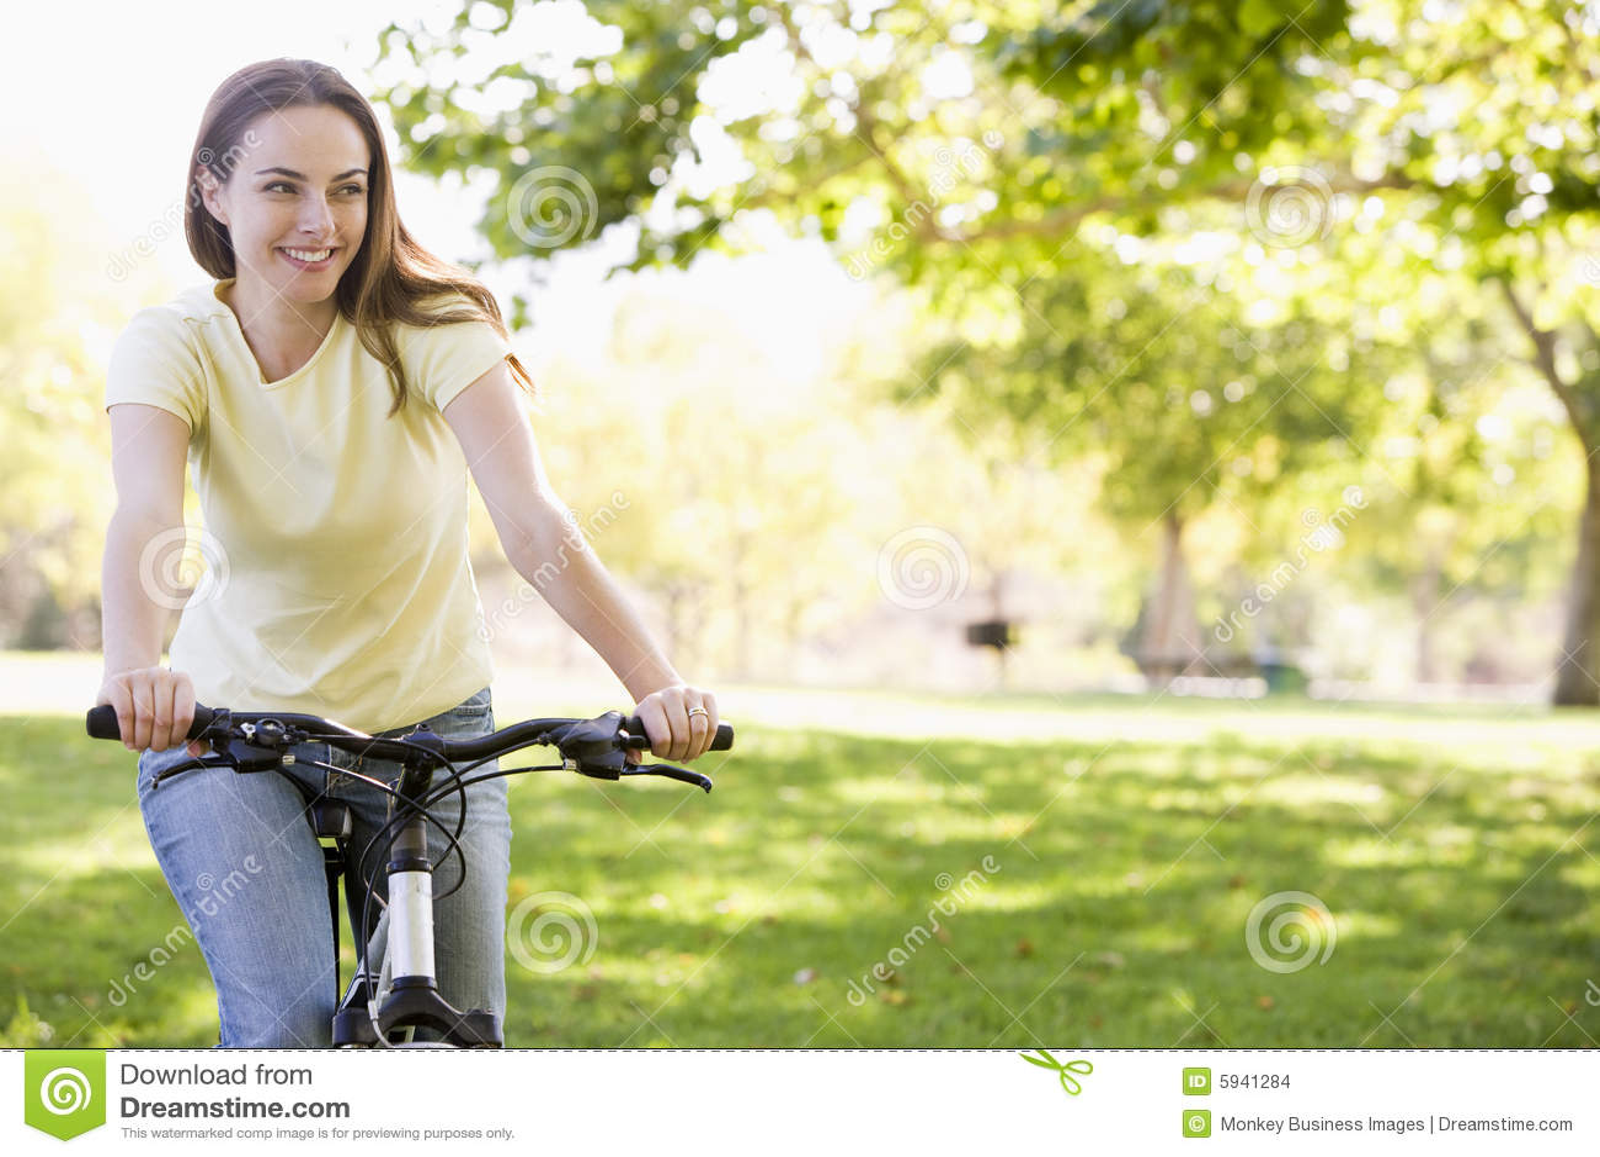 Bicycle smiling woman